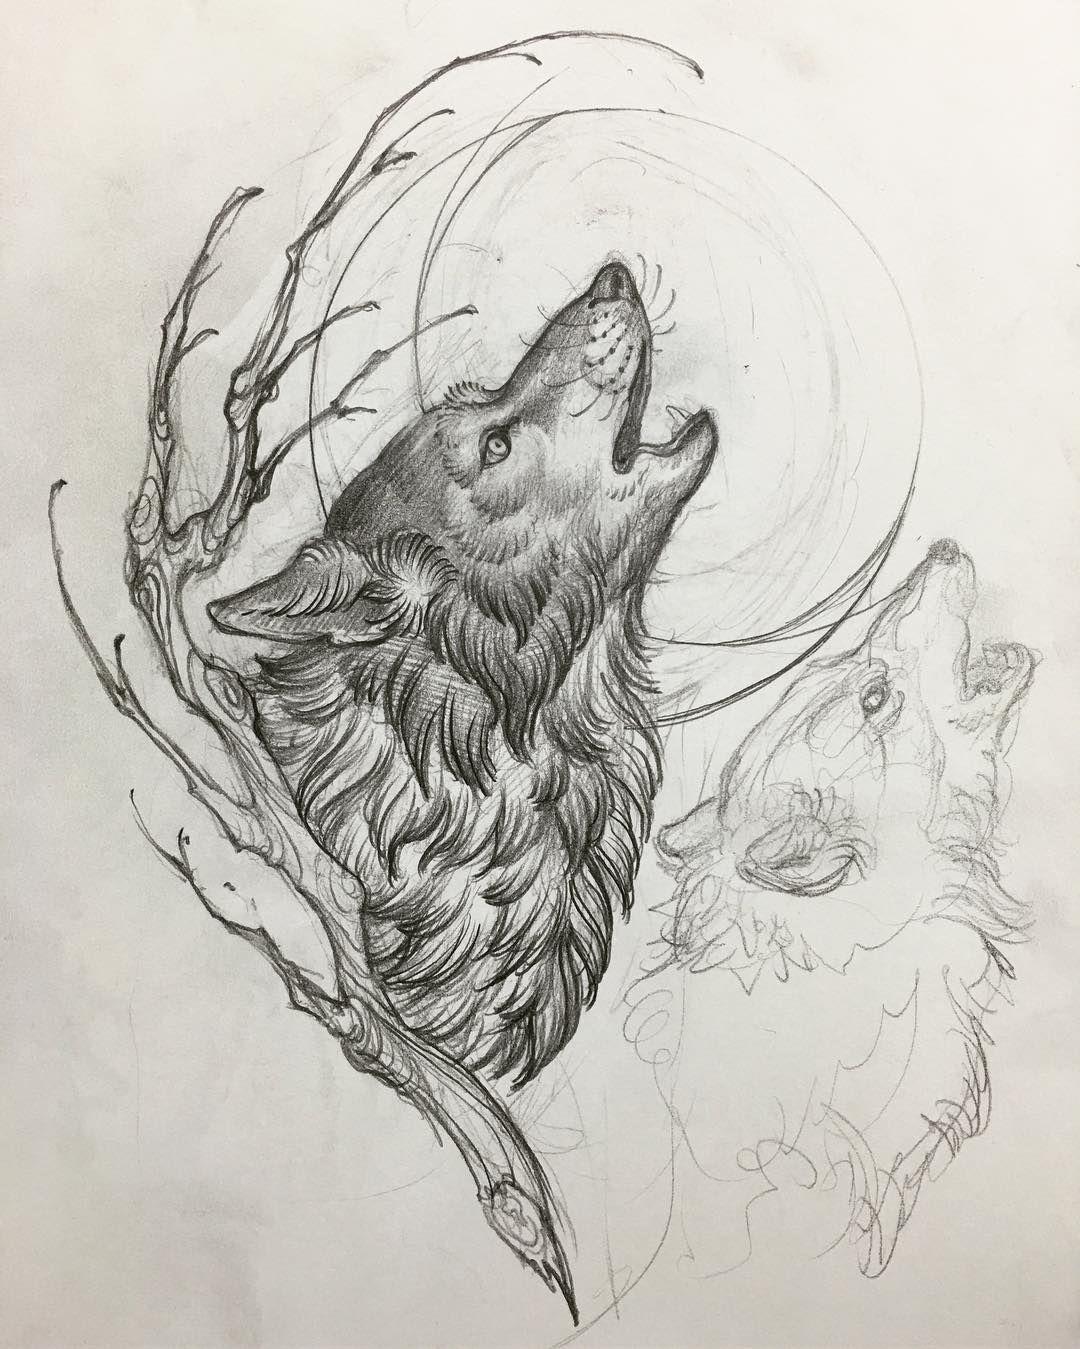 Matt Buck On Instagram One Wolf Moon Noidolsnyc Wolftattoo Wolfmoon In 2020 Wolf And Moon Tattoo Wolf Tattoo Design Wolf Art